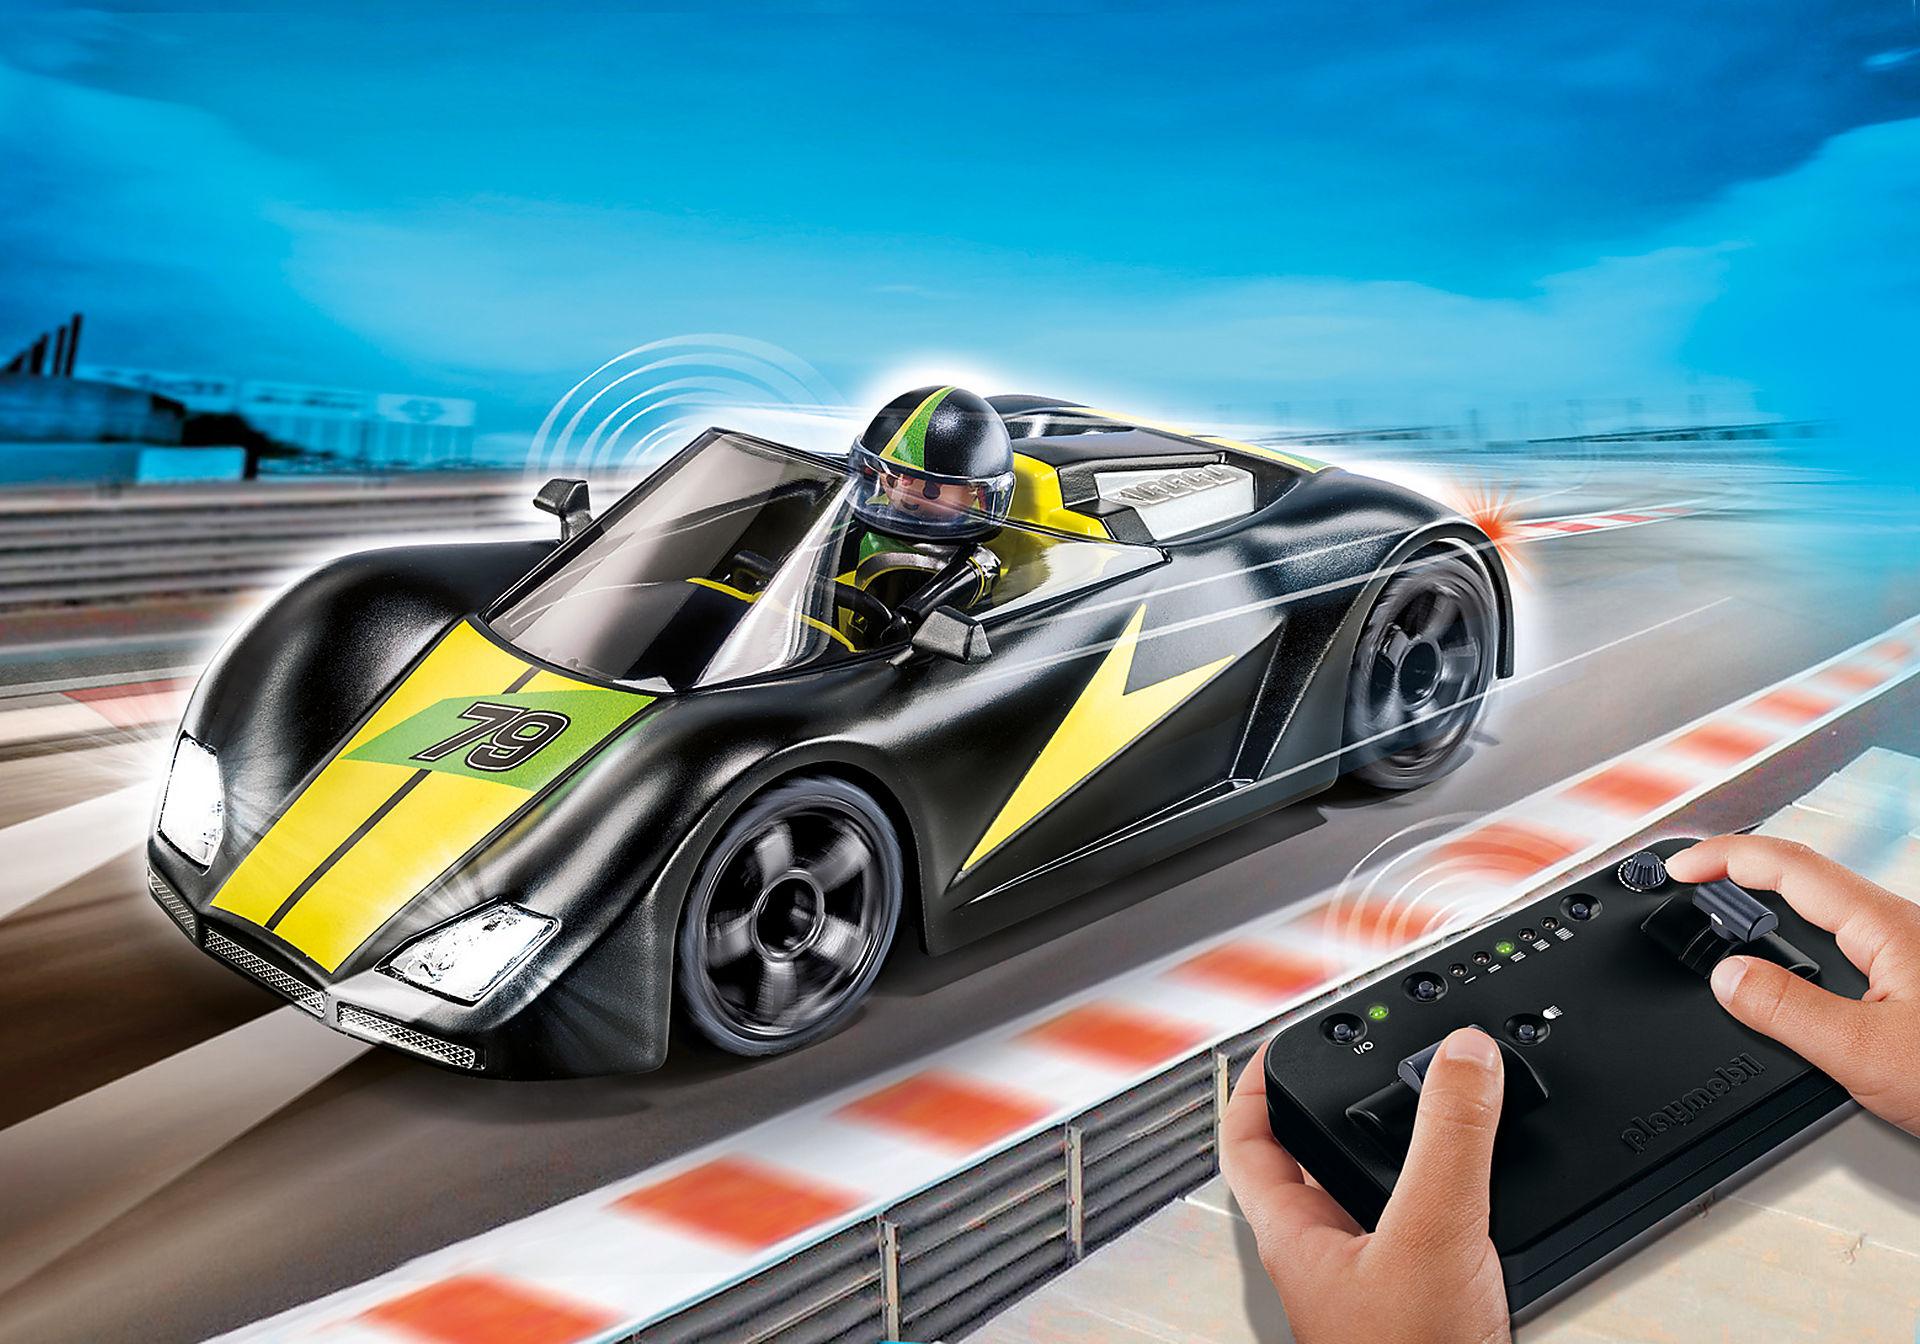 9089 RC Turbo Racer zoom image1